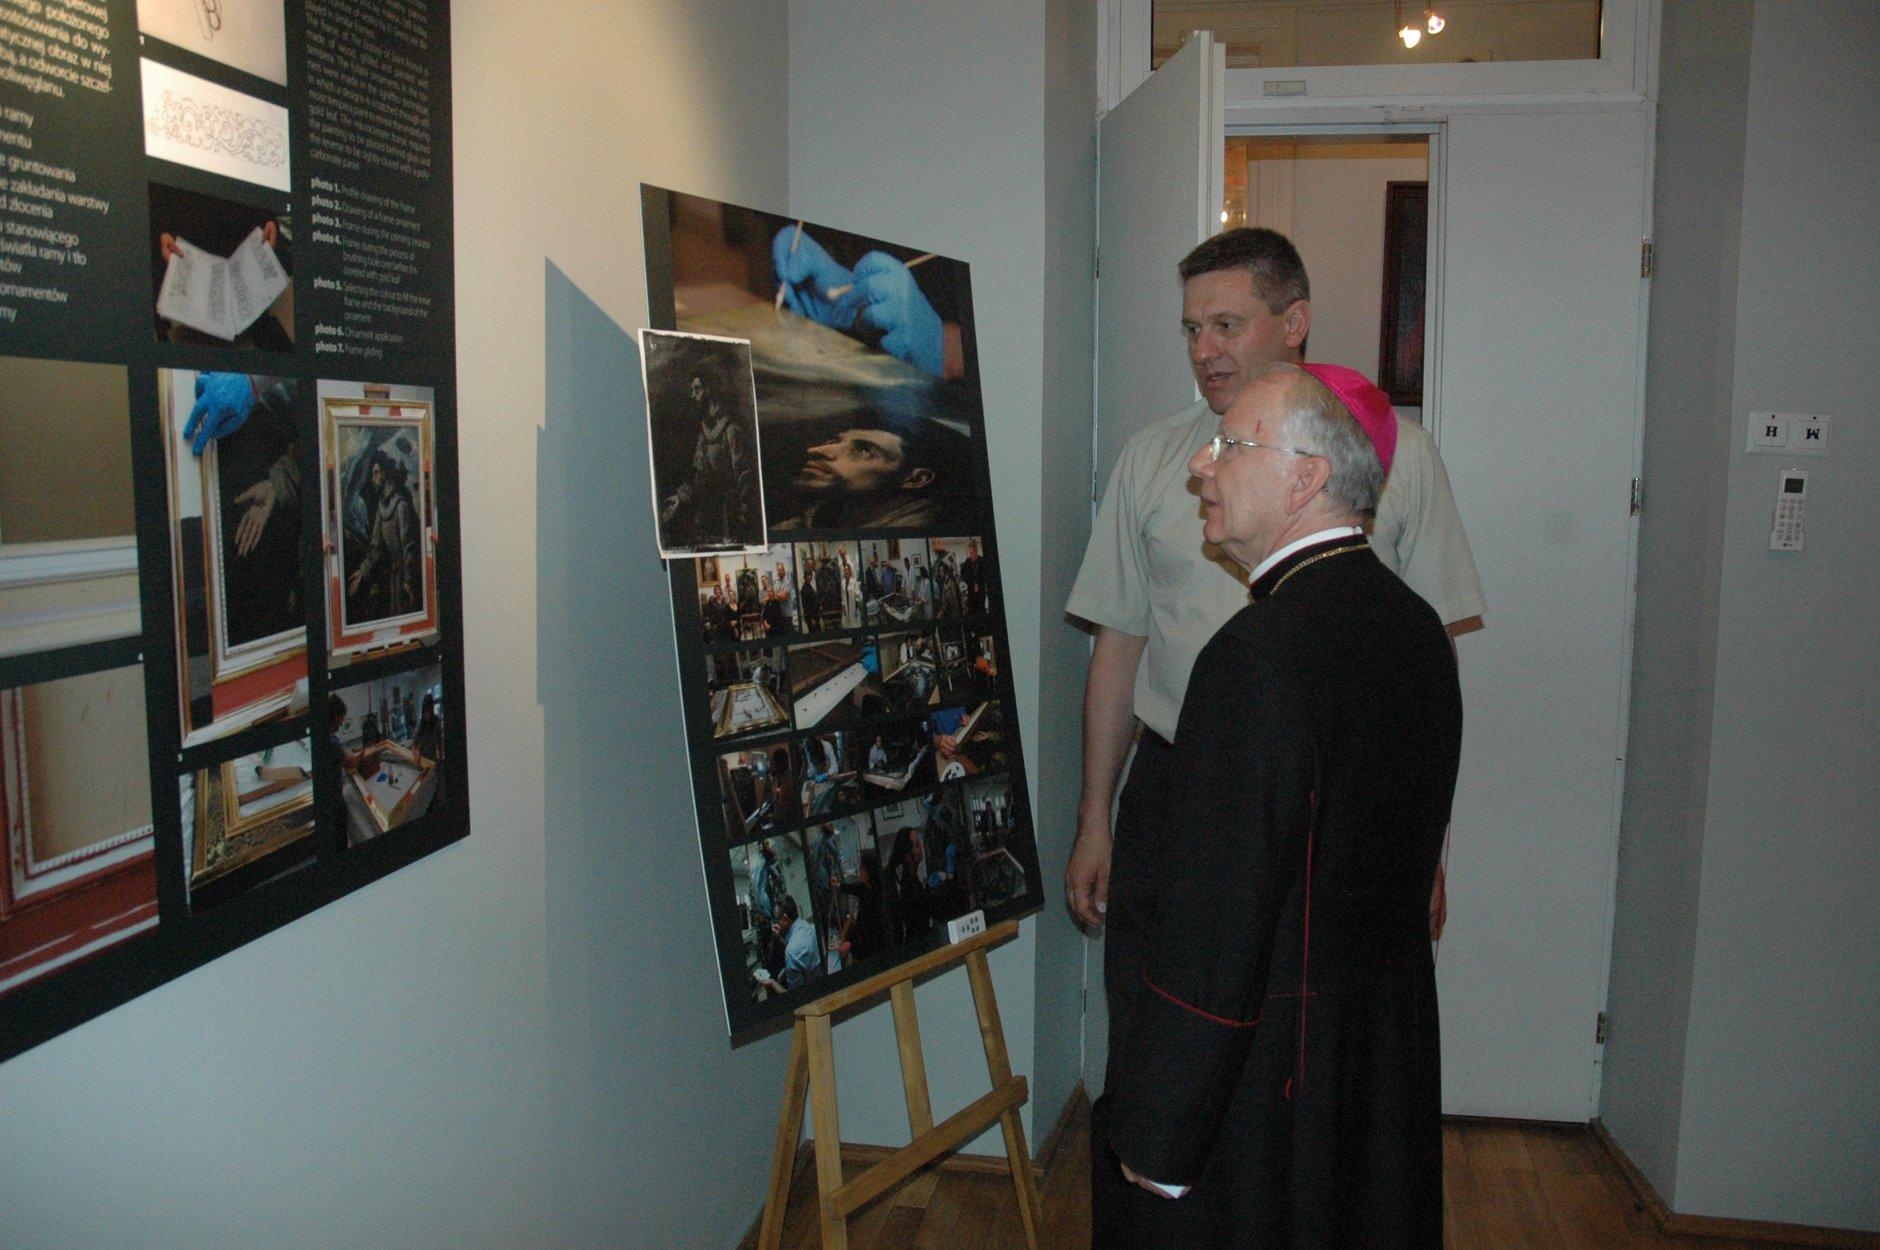 muzeum jedraszevski 3